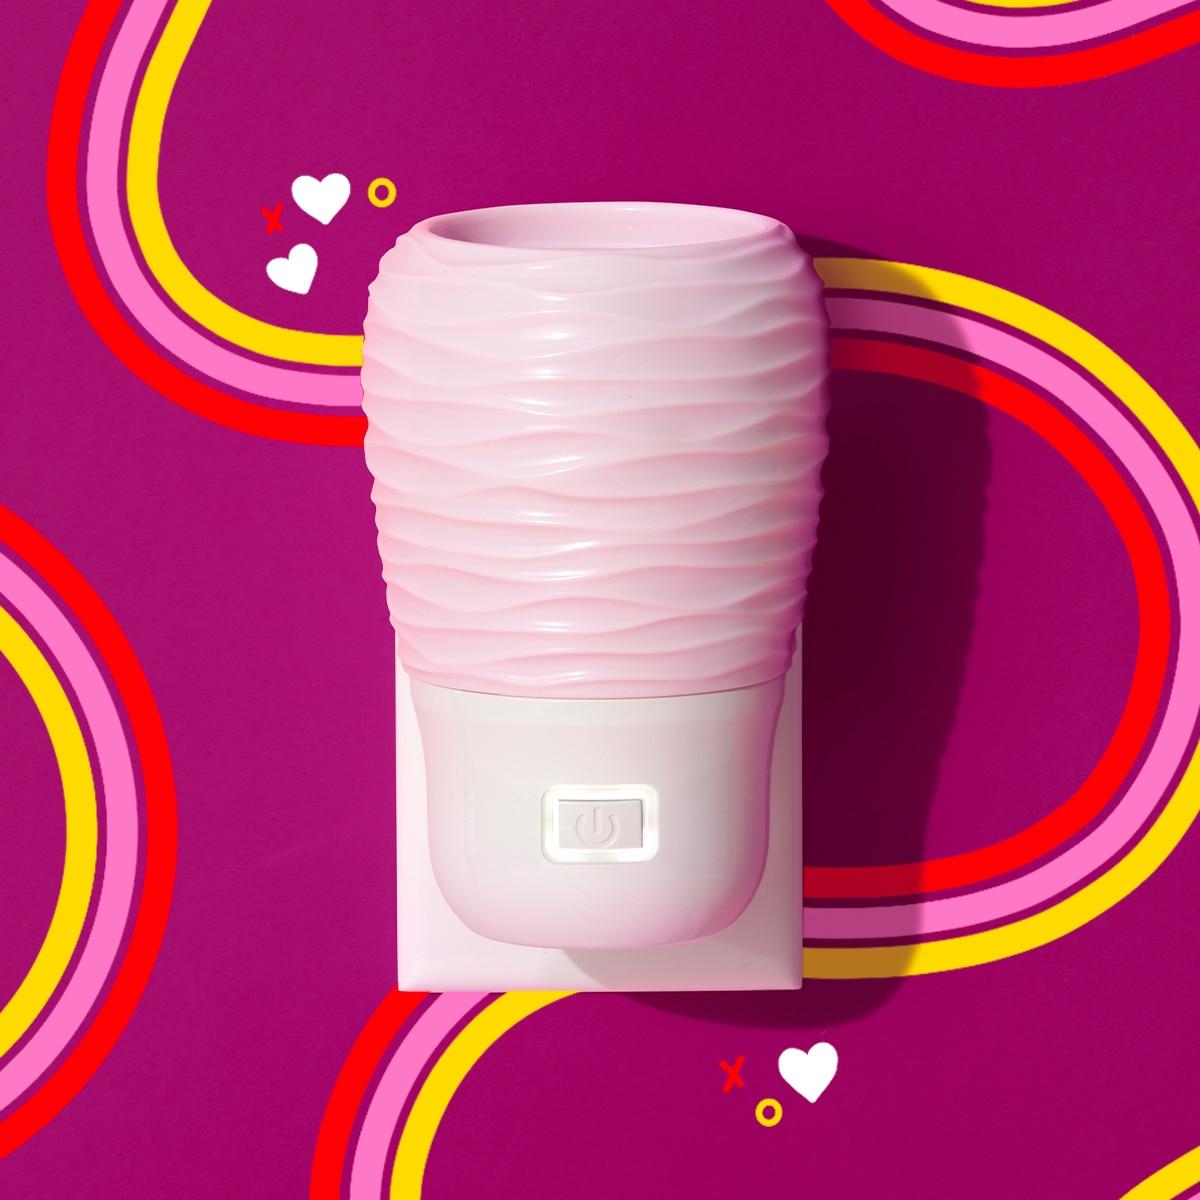 wall fan blush pink scentsy